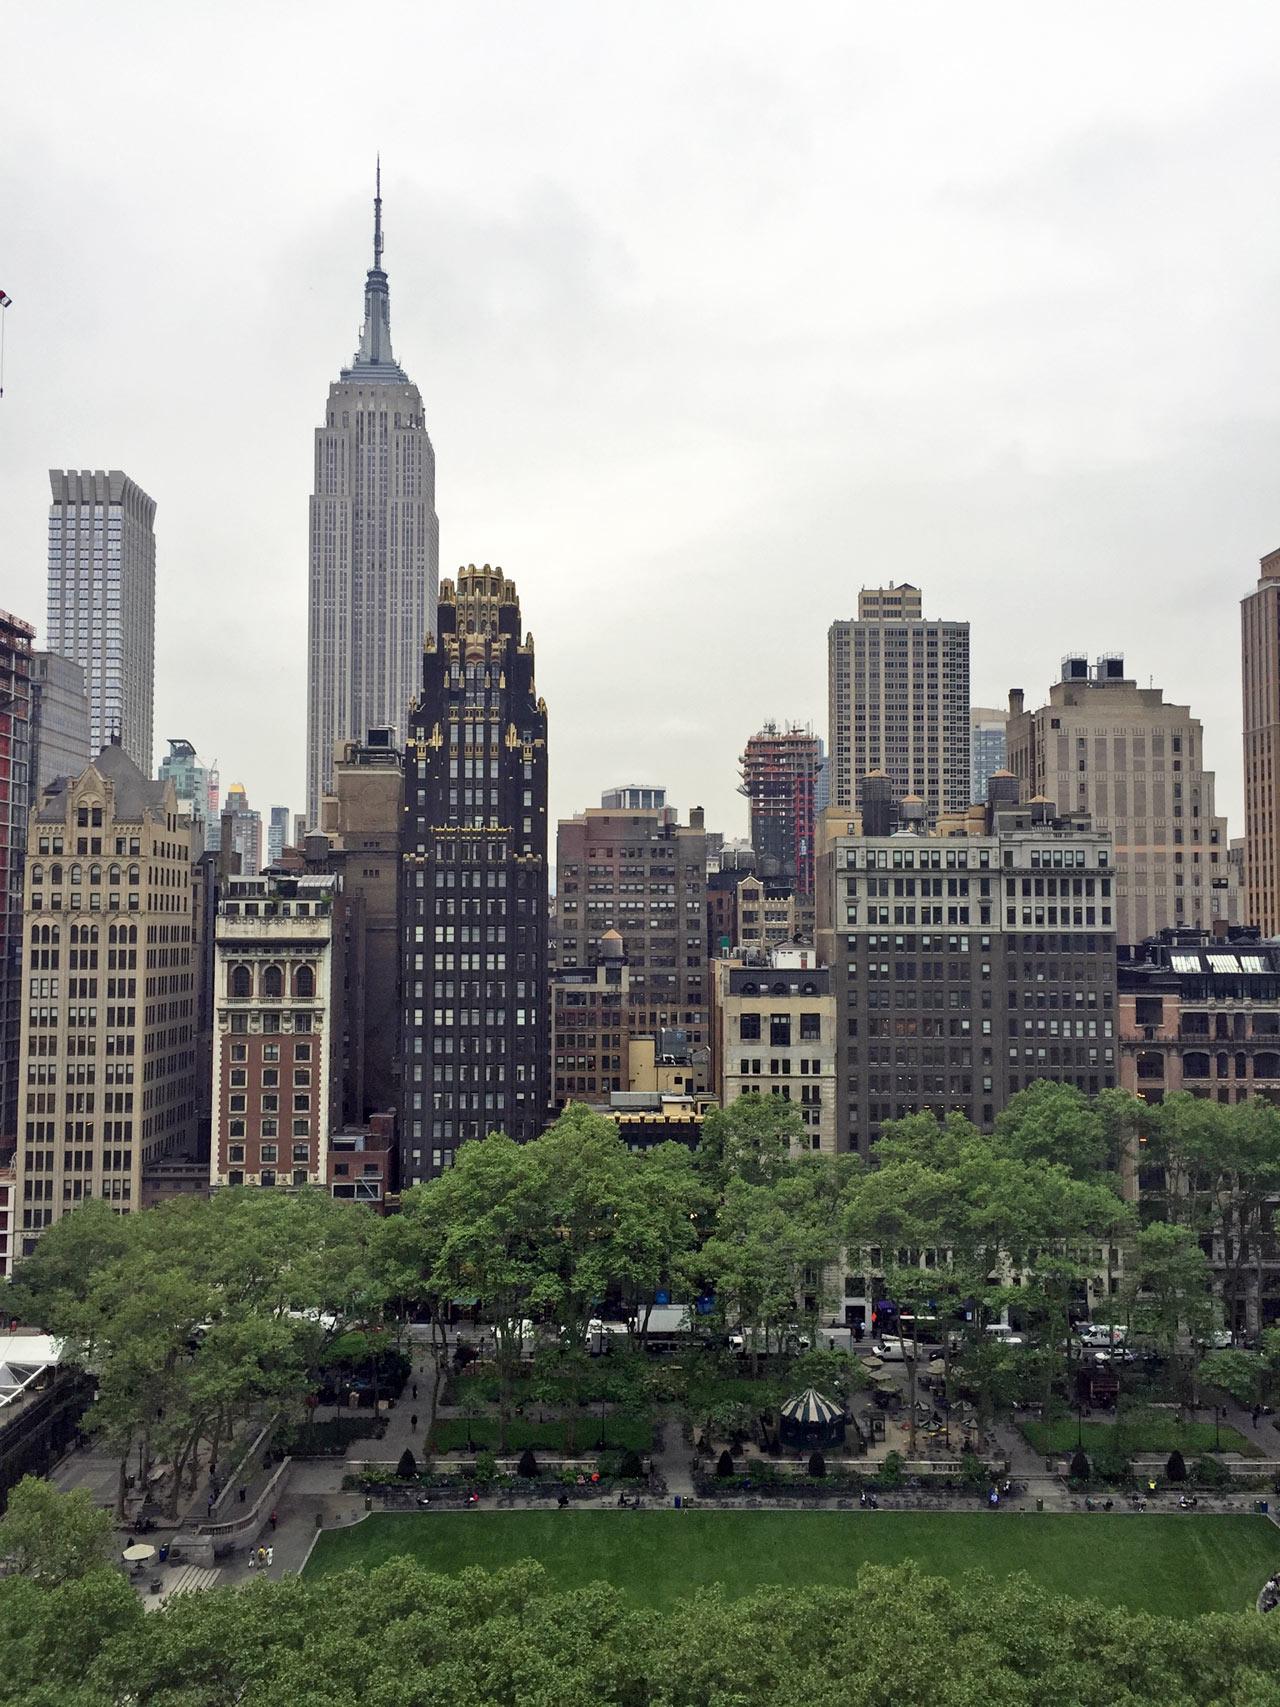 Design Milk Travels to… New York City